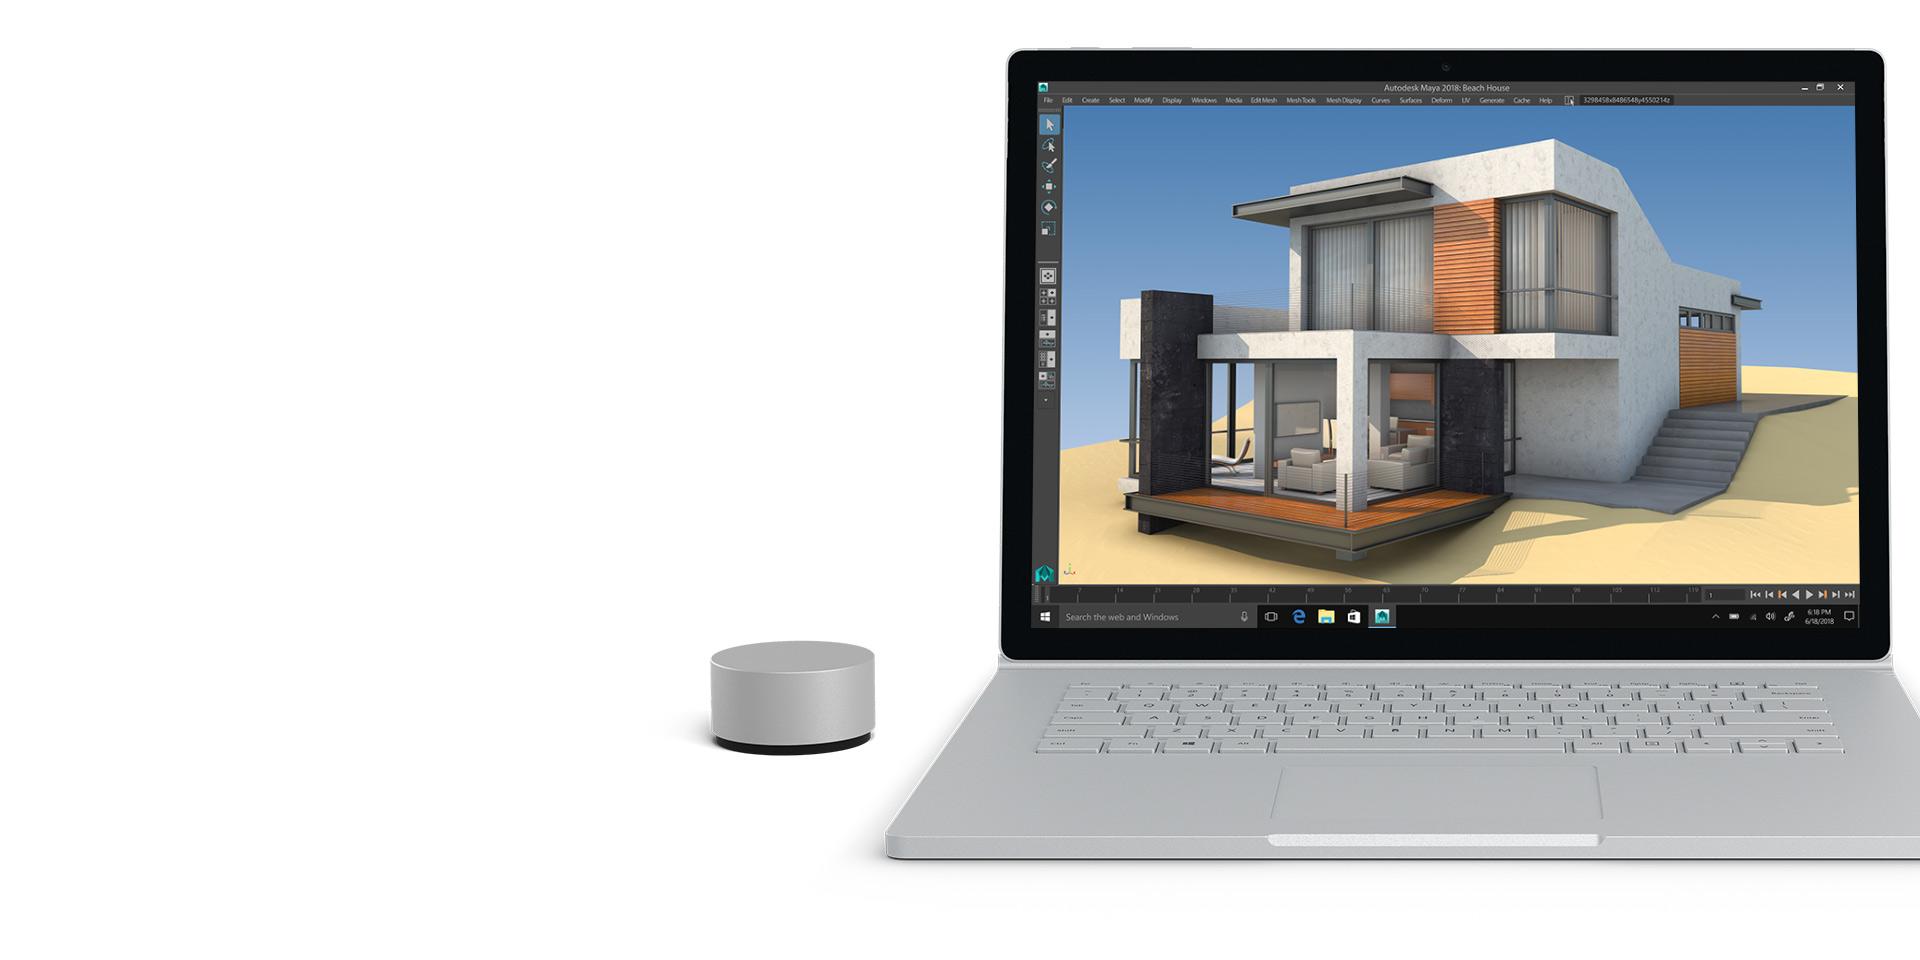 Autodesk Maya on a Surface Book 2 display